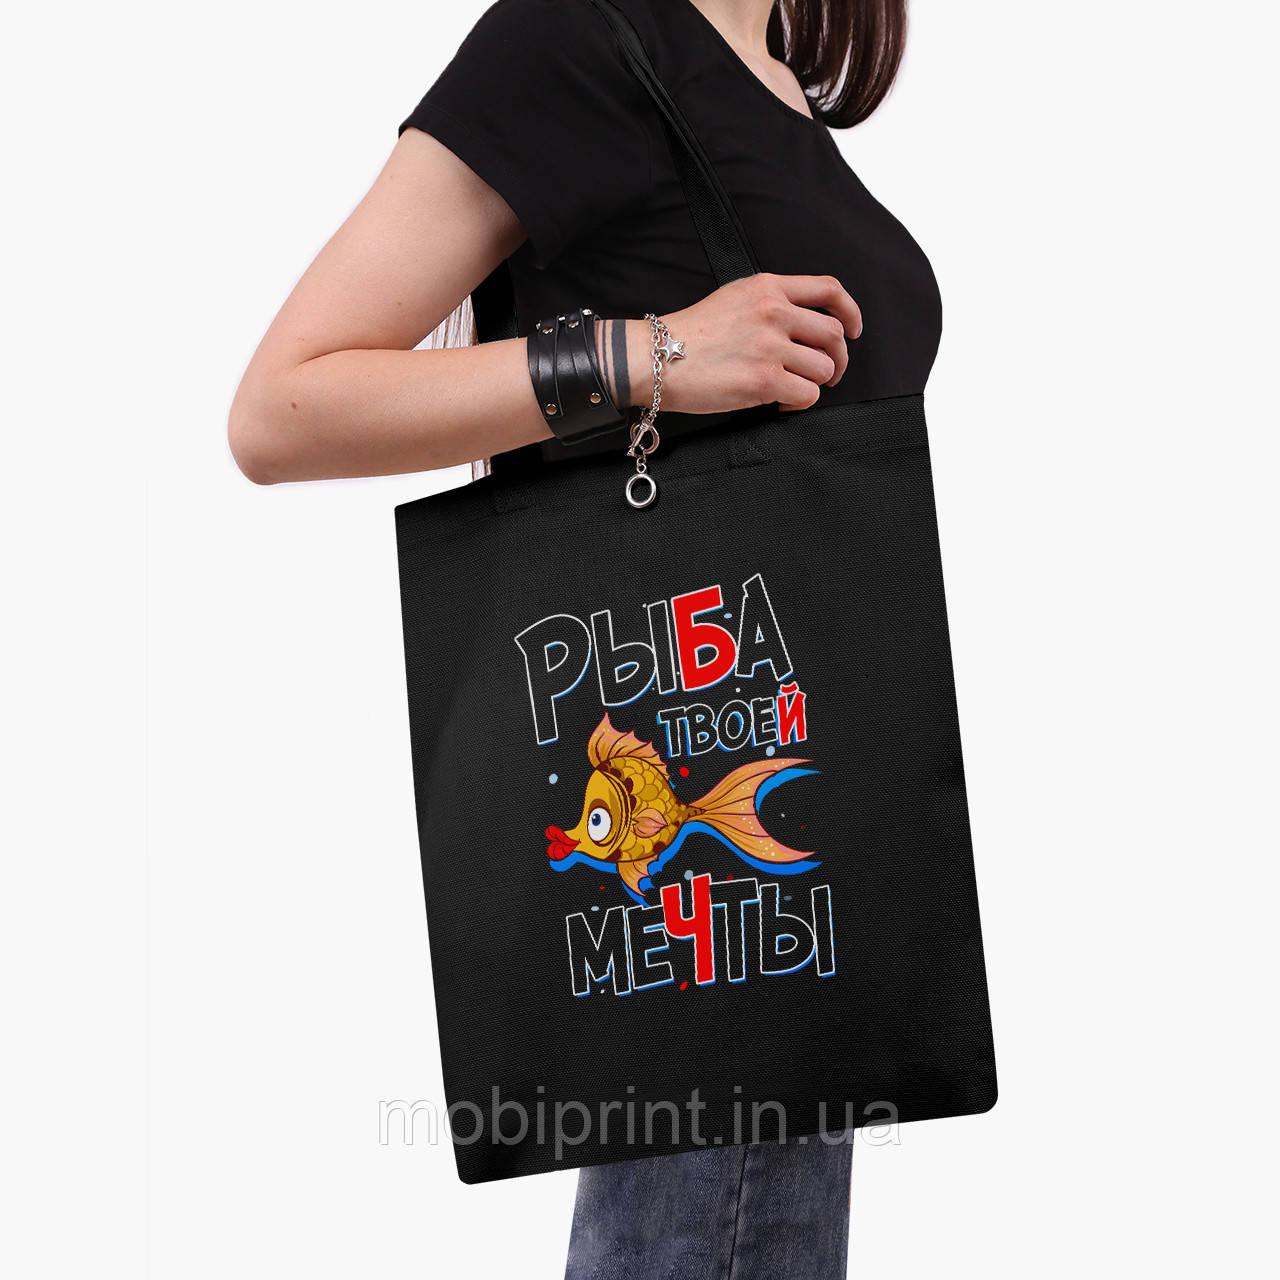 Эко сумка шоппер черная Рыба моей мечты (Fish of my dreams) (9227-1261-2)  экосумка шопер 41*35 см